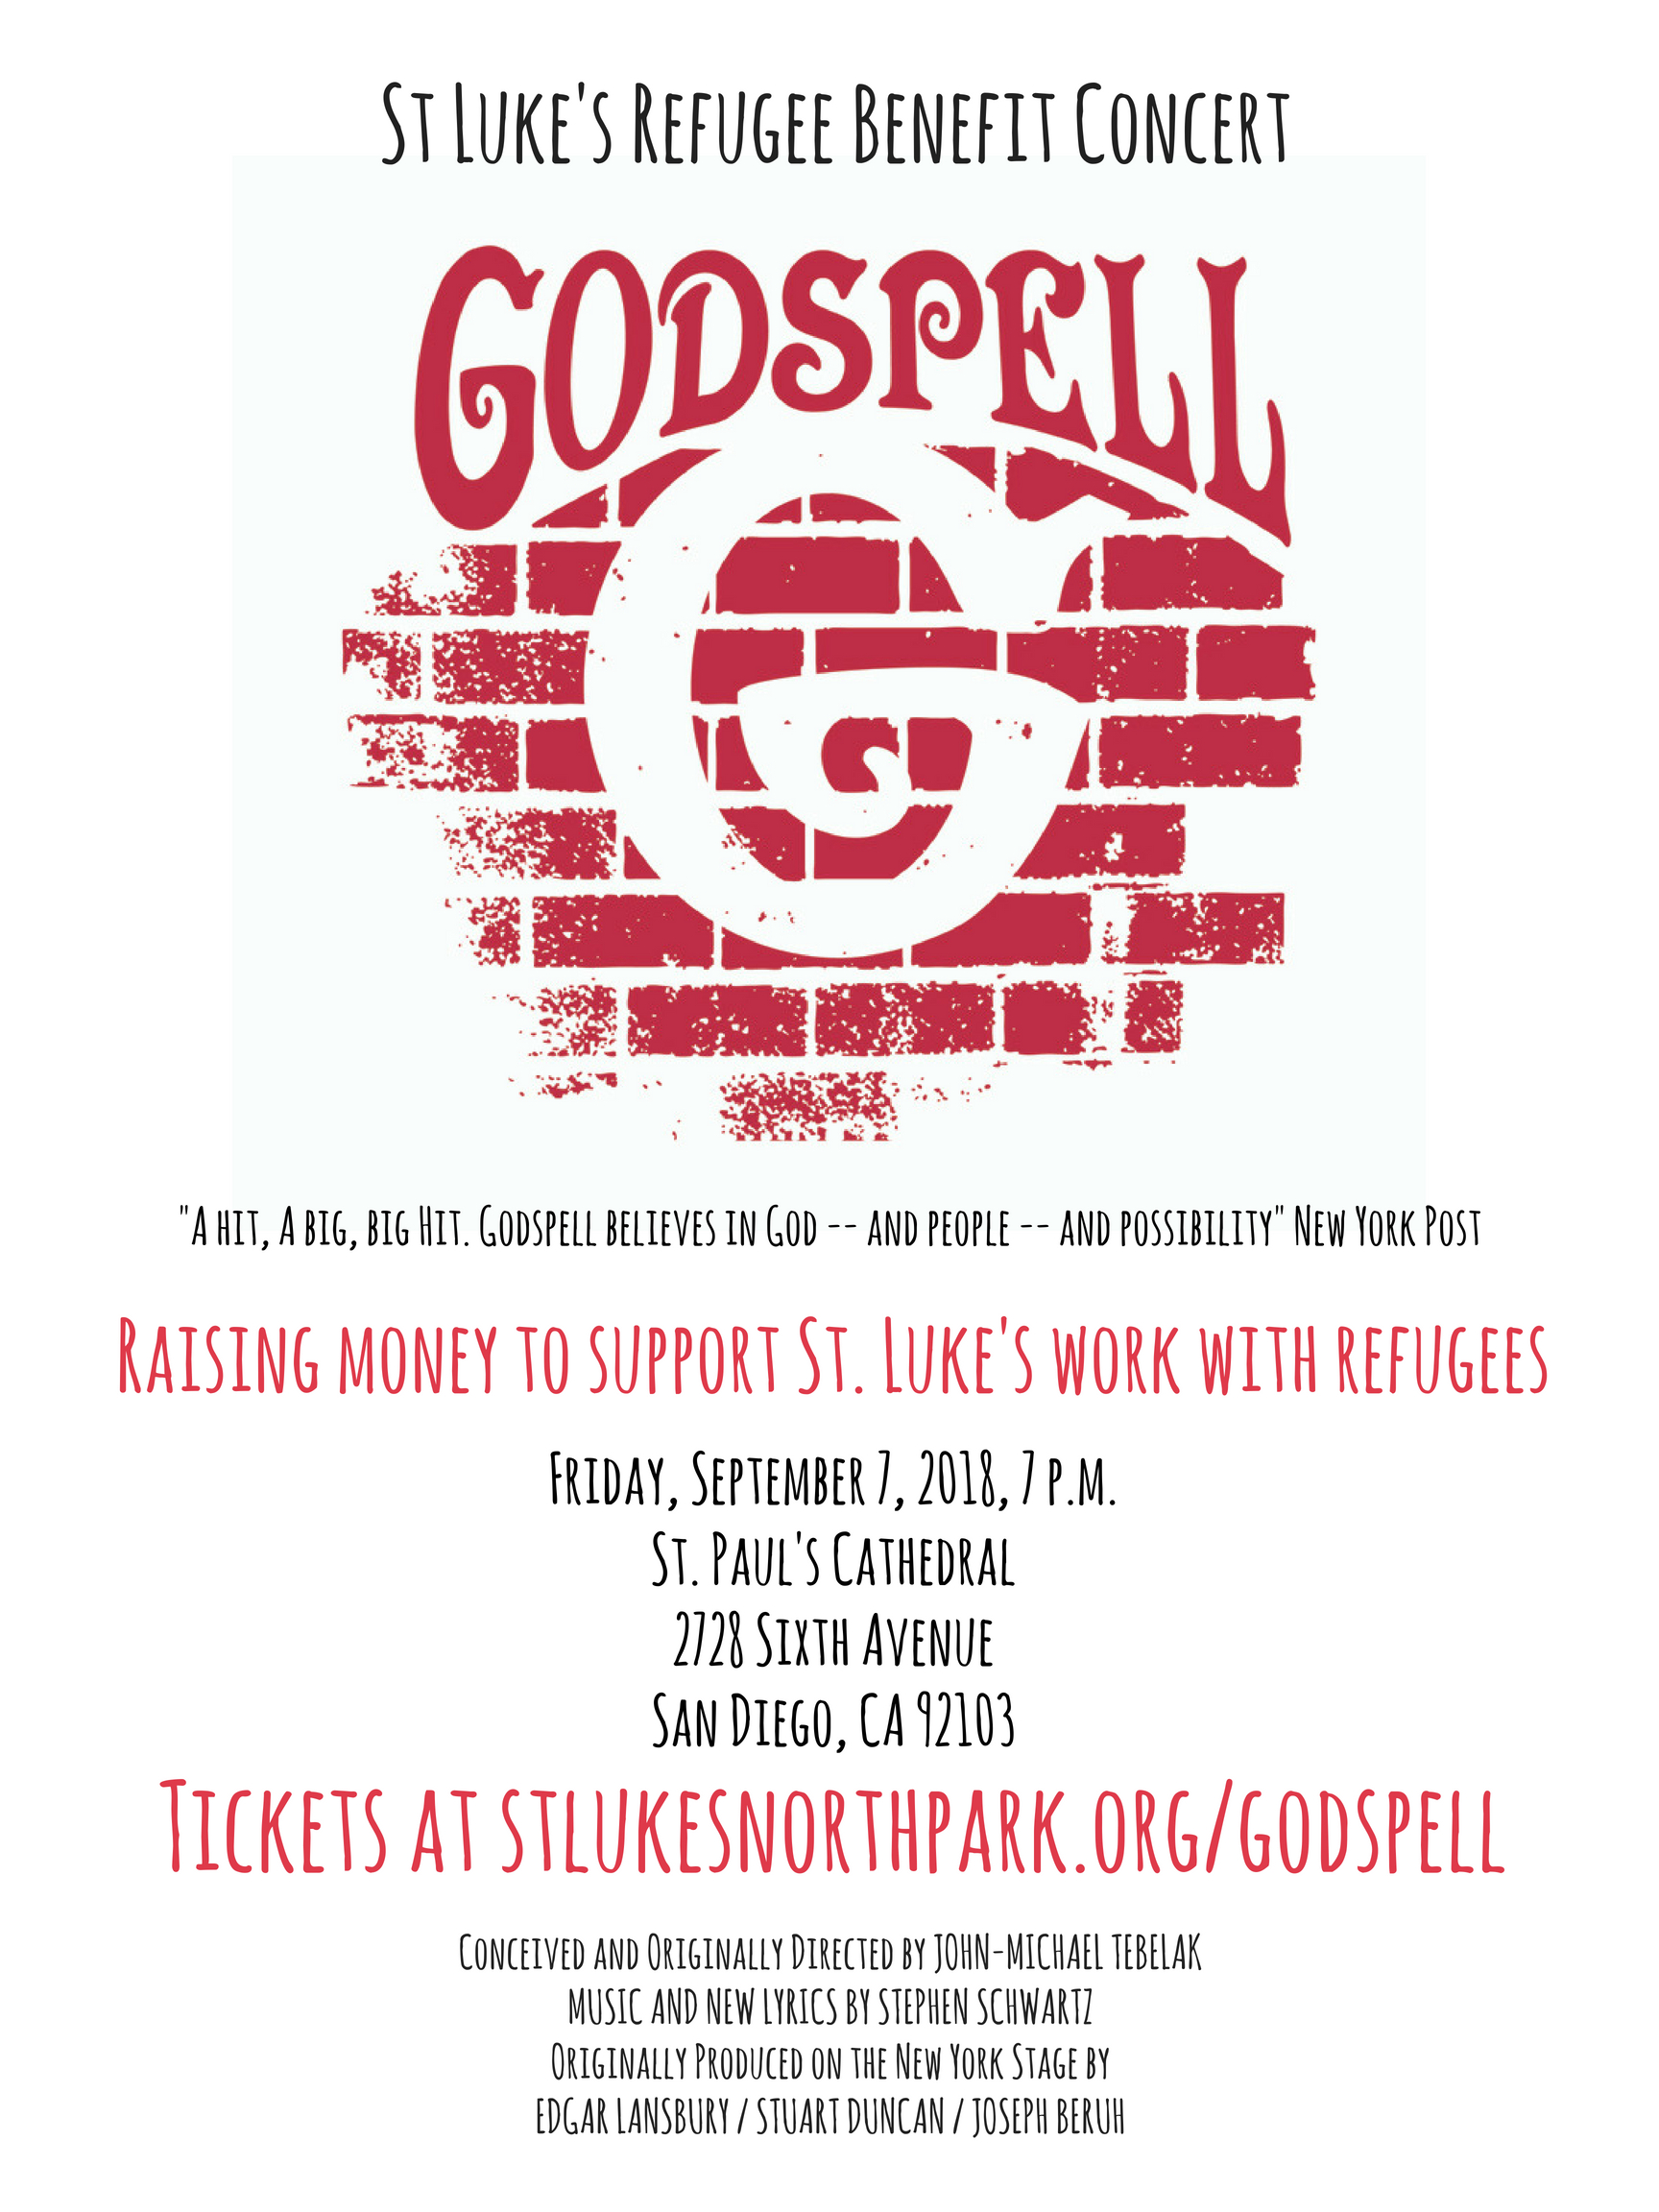 Godspell refugee benefit concert San Diego St Lukes